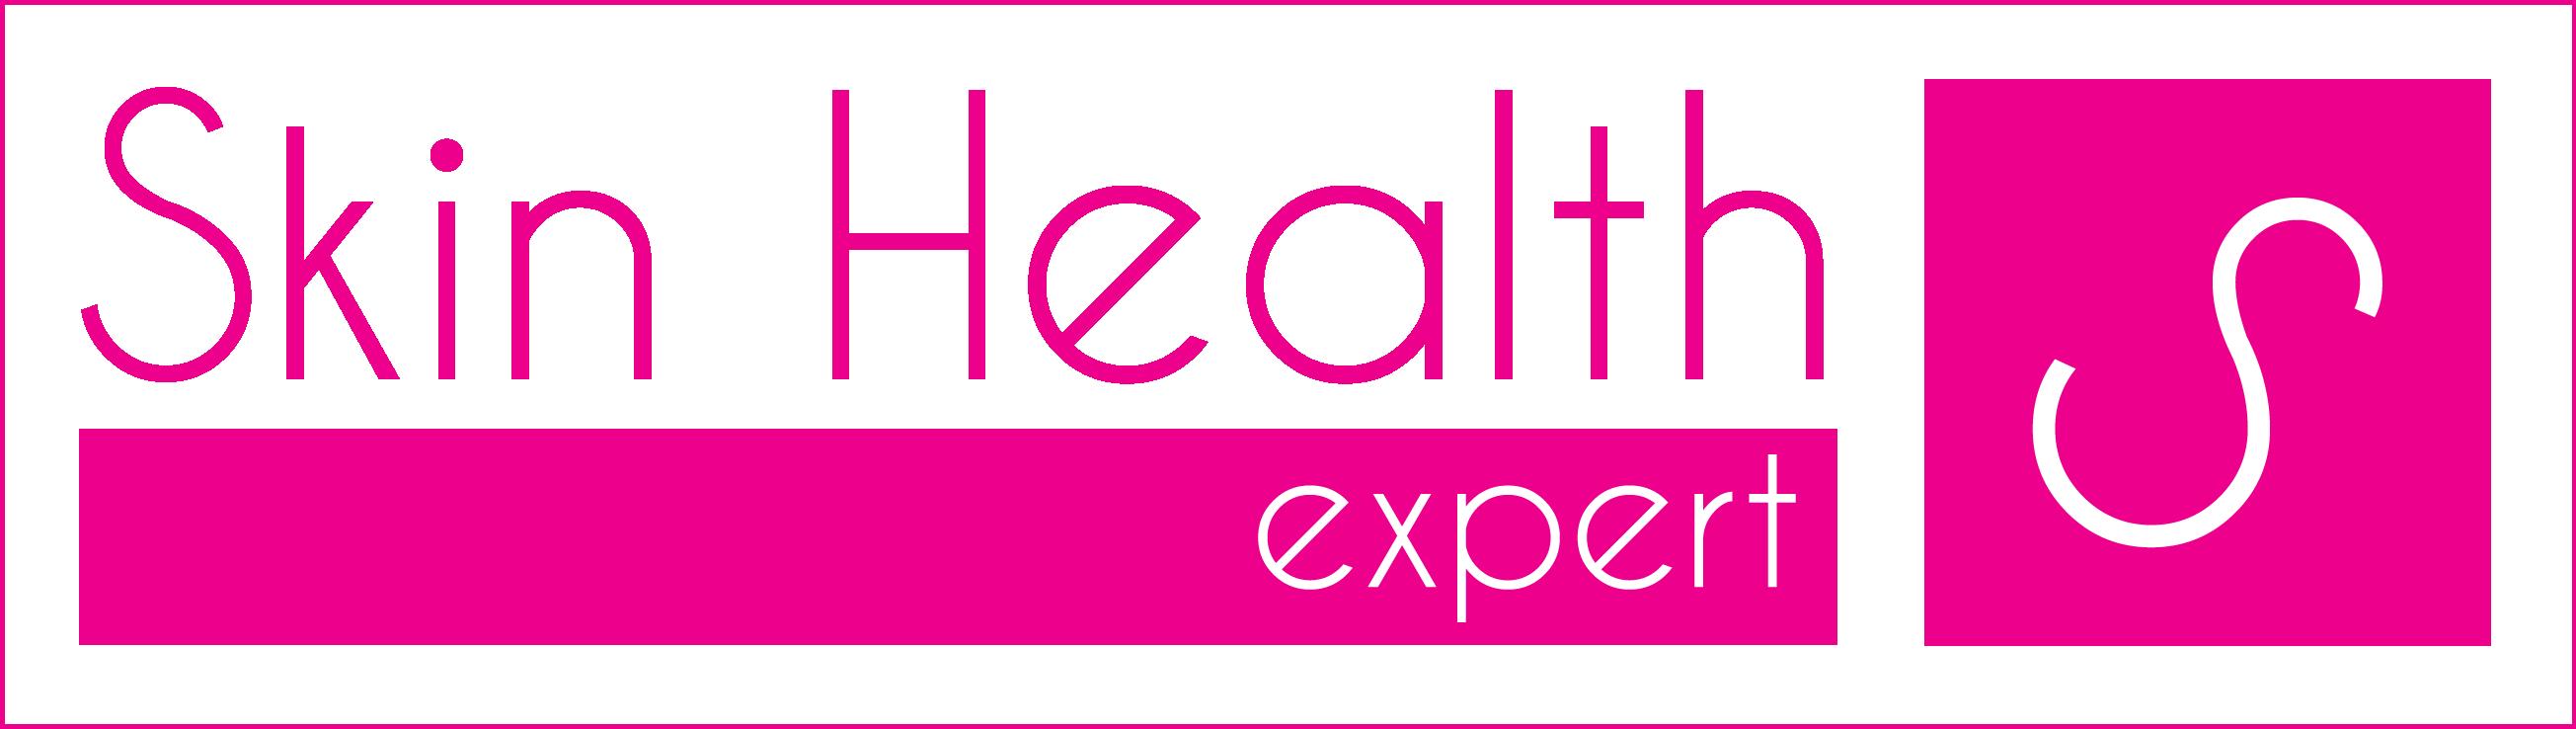 Skinhealthexpert